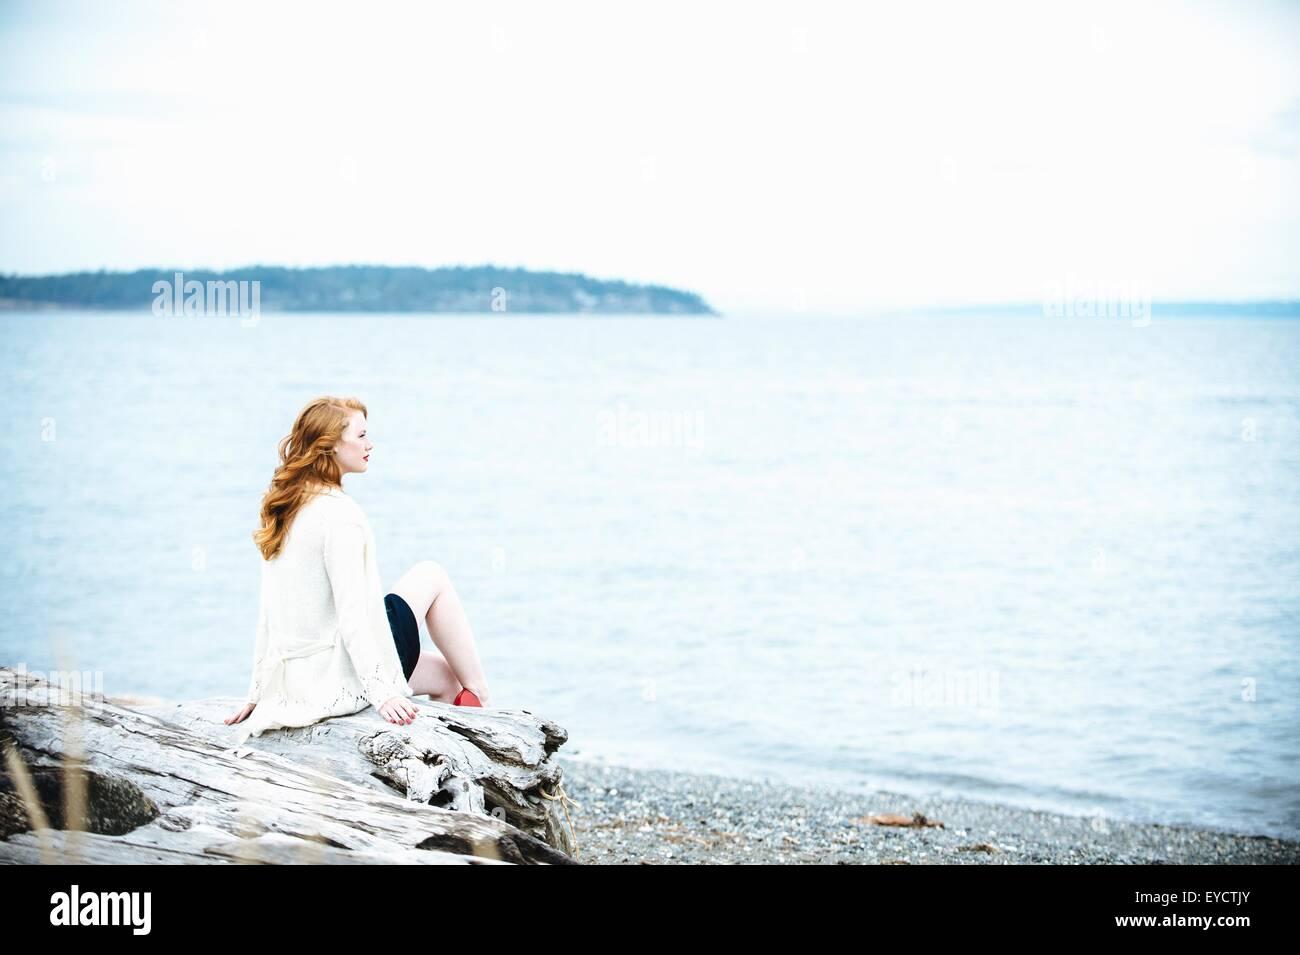 Junge Frau sitzt am Strand mit Blick auf Meer, Bainbridge Island, Washington State, USA Stockbild